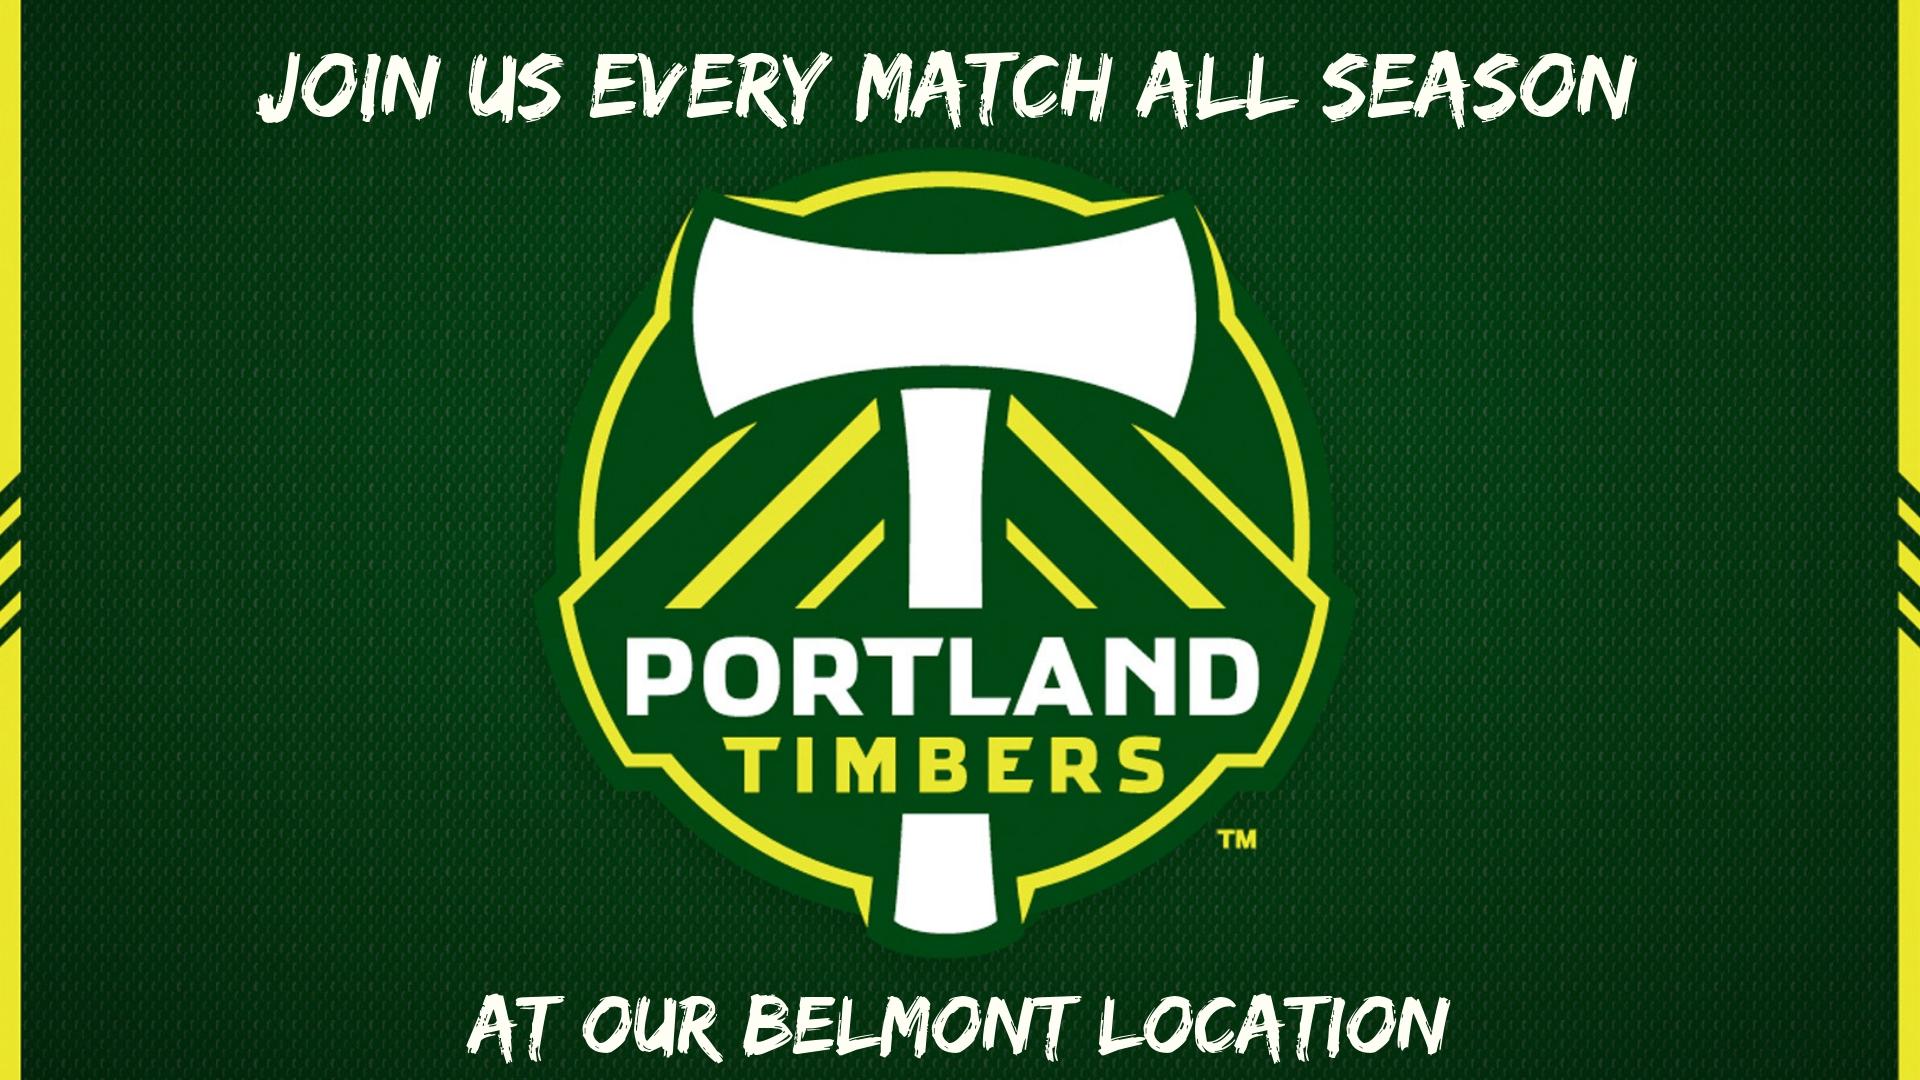 Join us every match all season.jpg